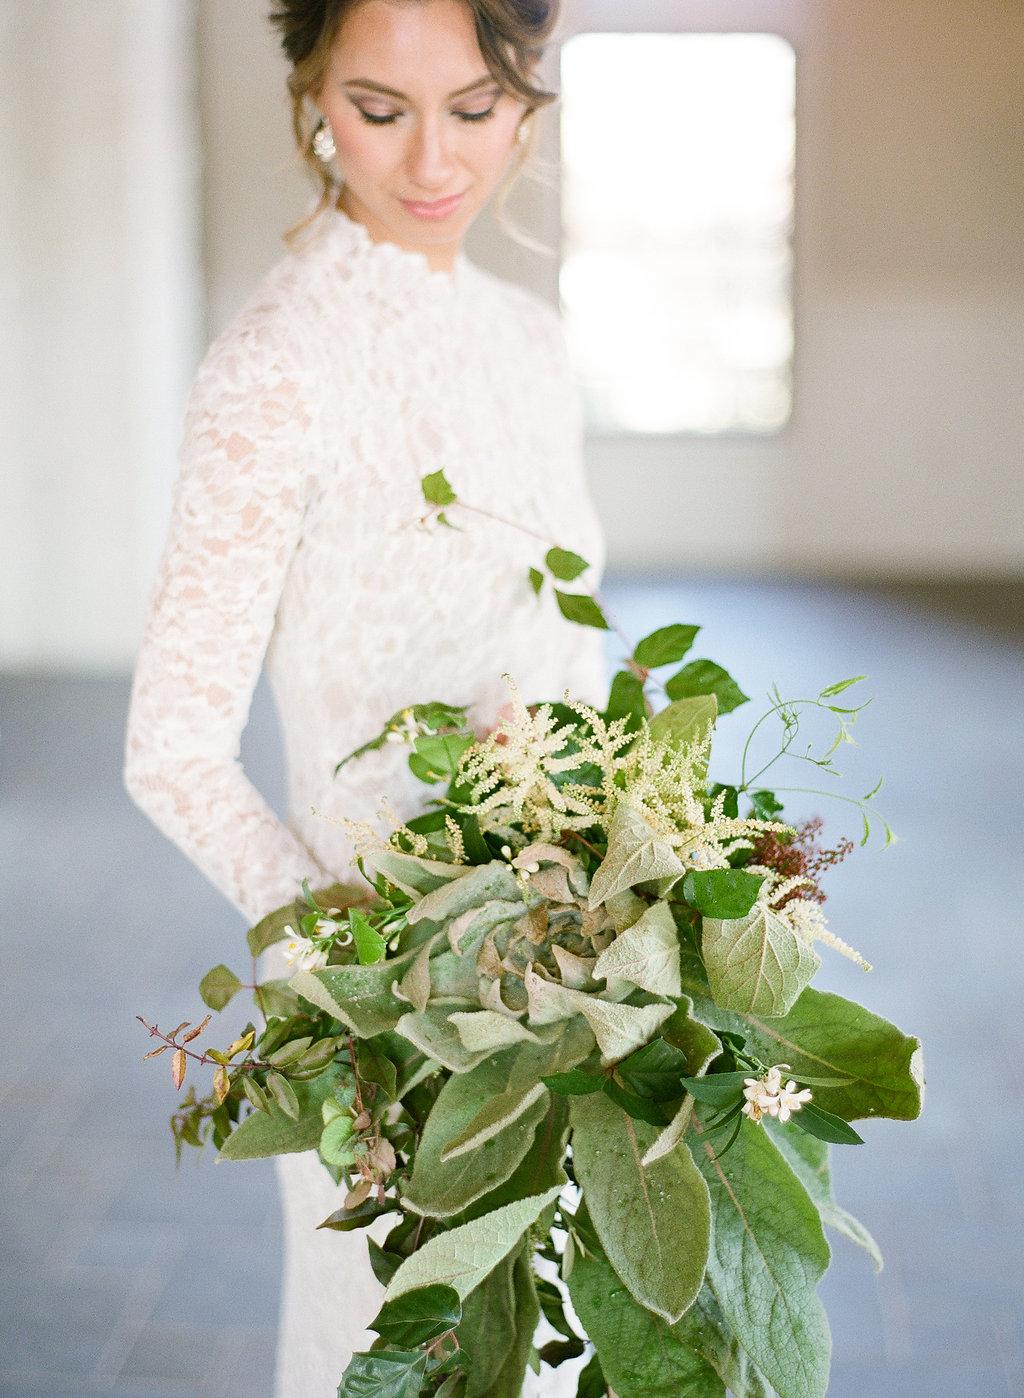 kristen_lynne_photography_early_mountain_vineyard_wedding-19